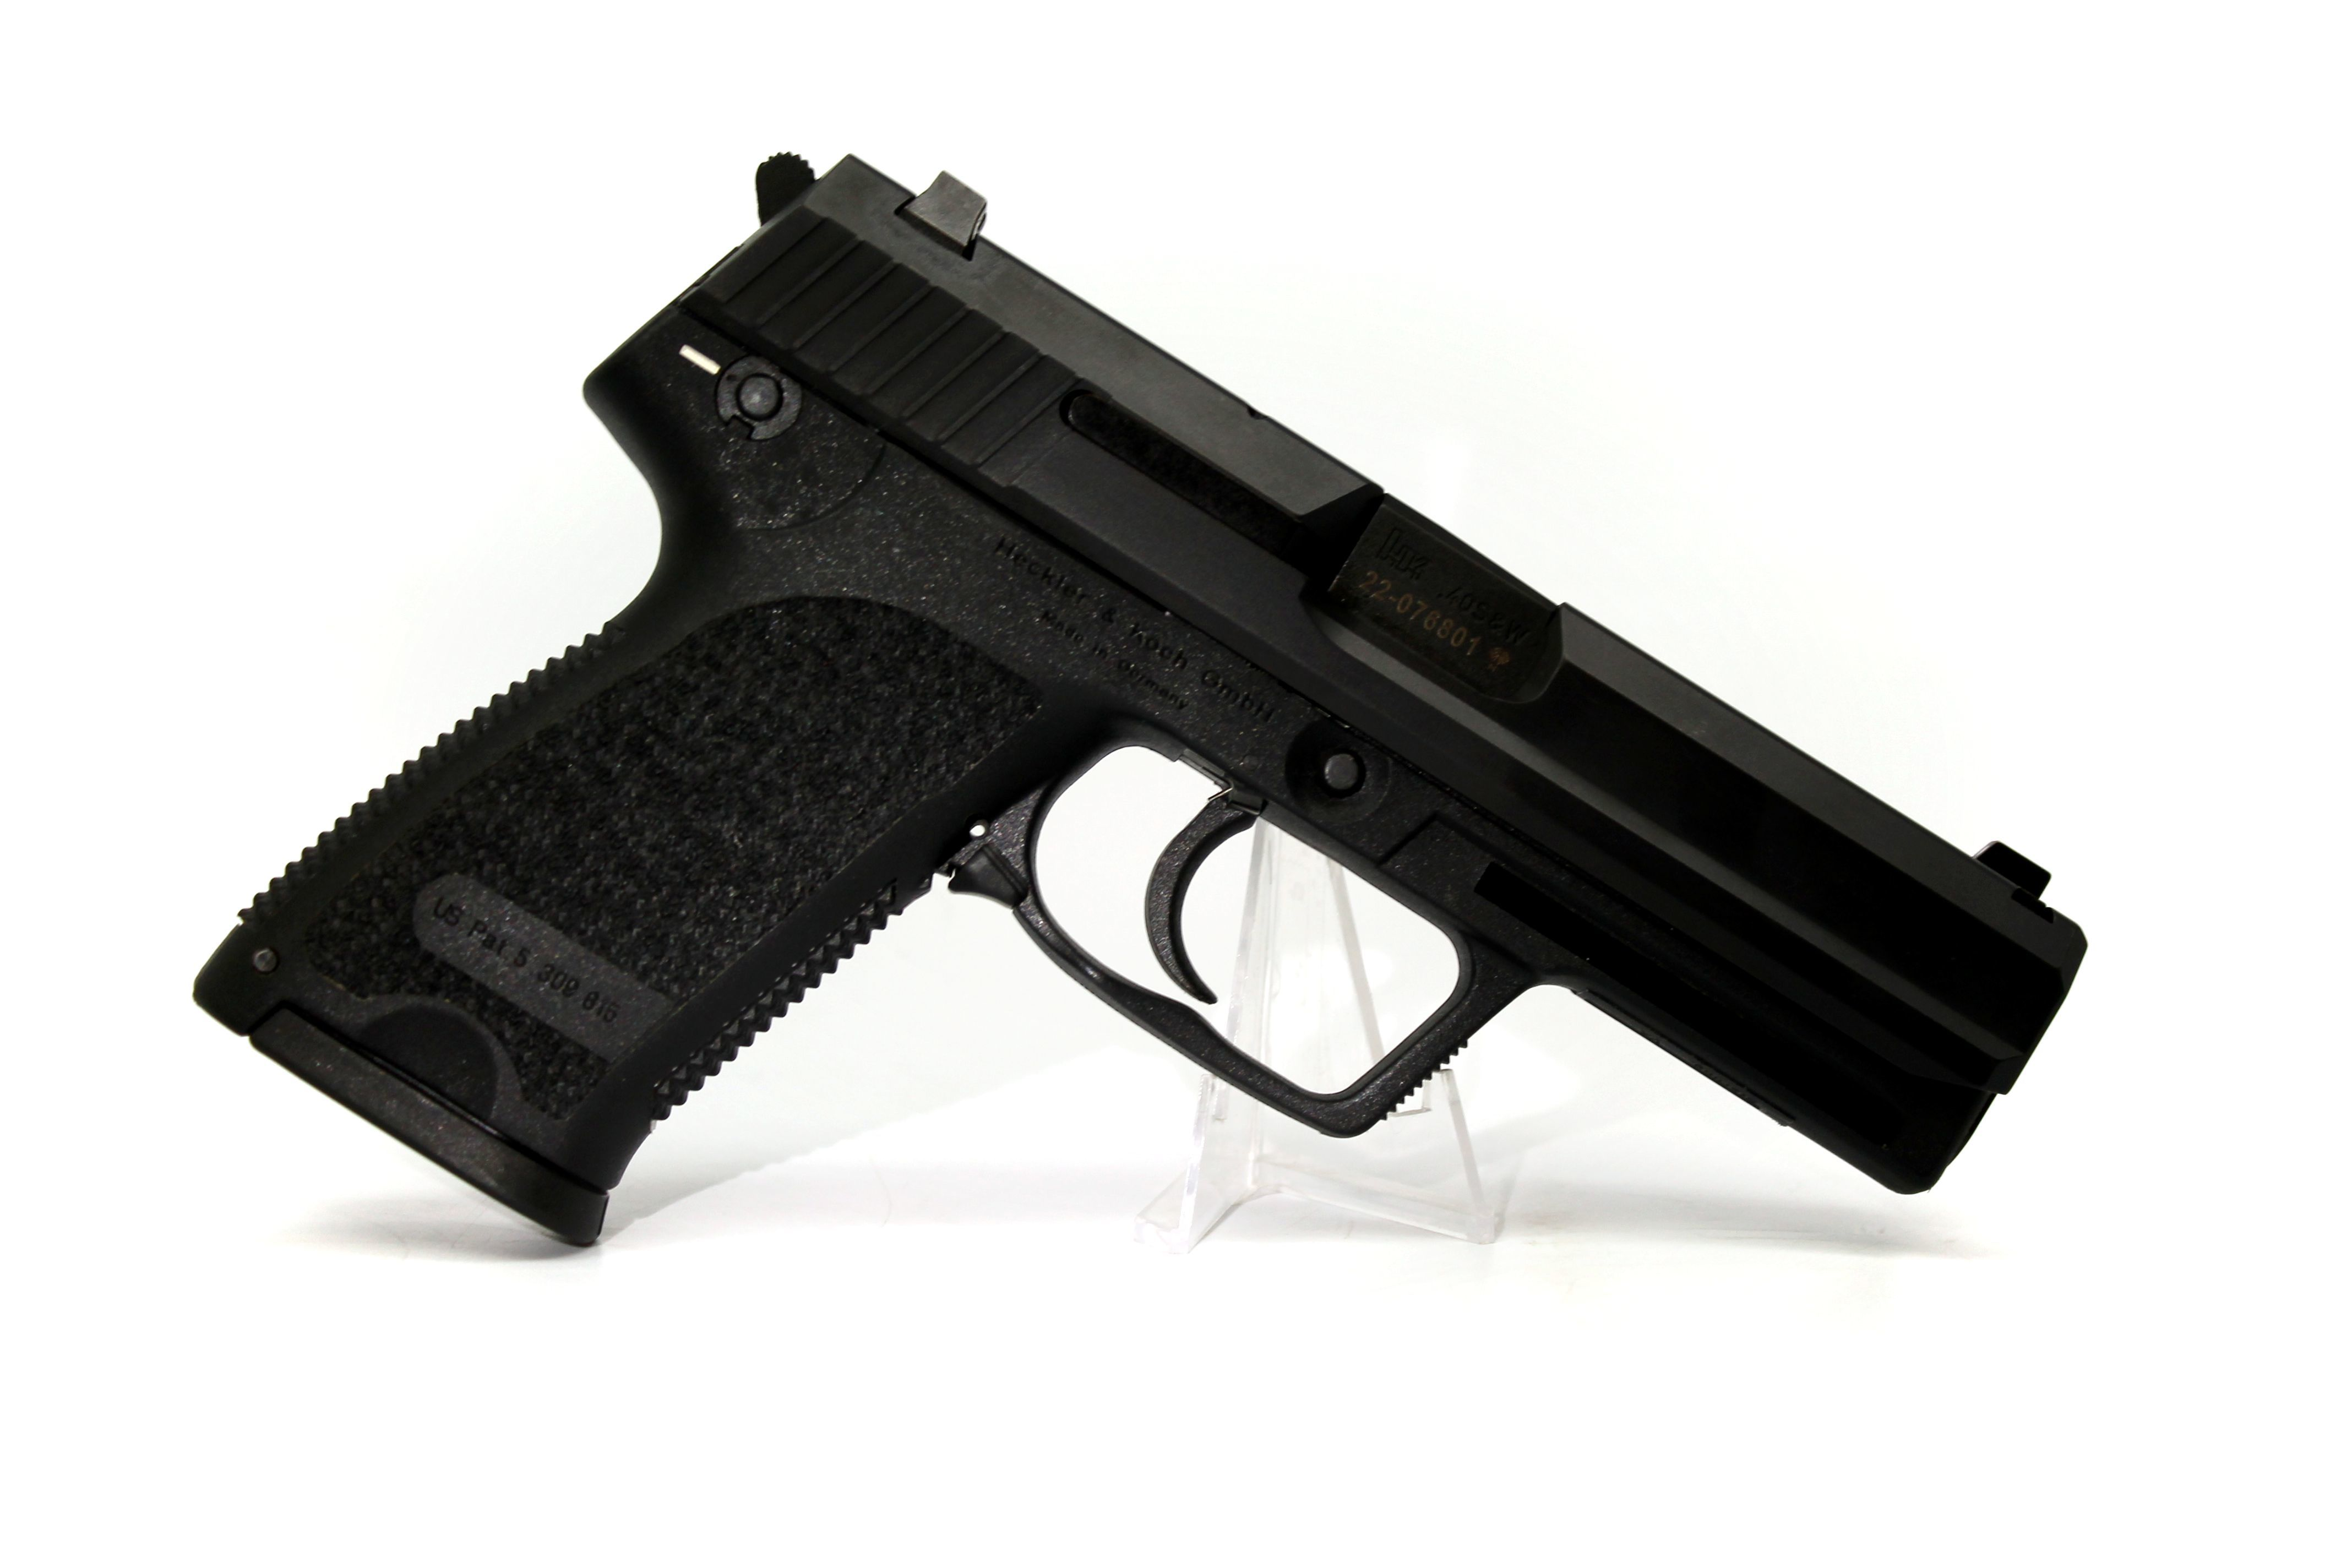 2001 Heckler & Koch .40 S&W USP Single/Double Action Semi-Automatic Pistol-LNIB